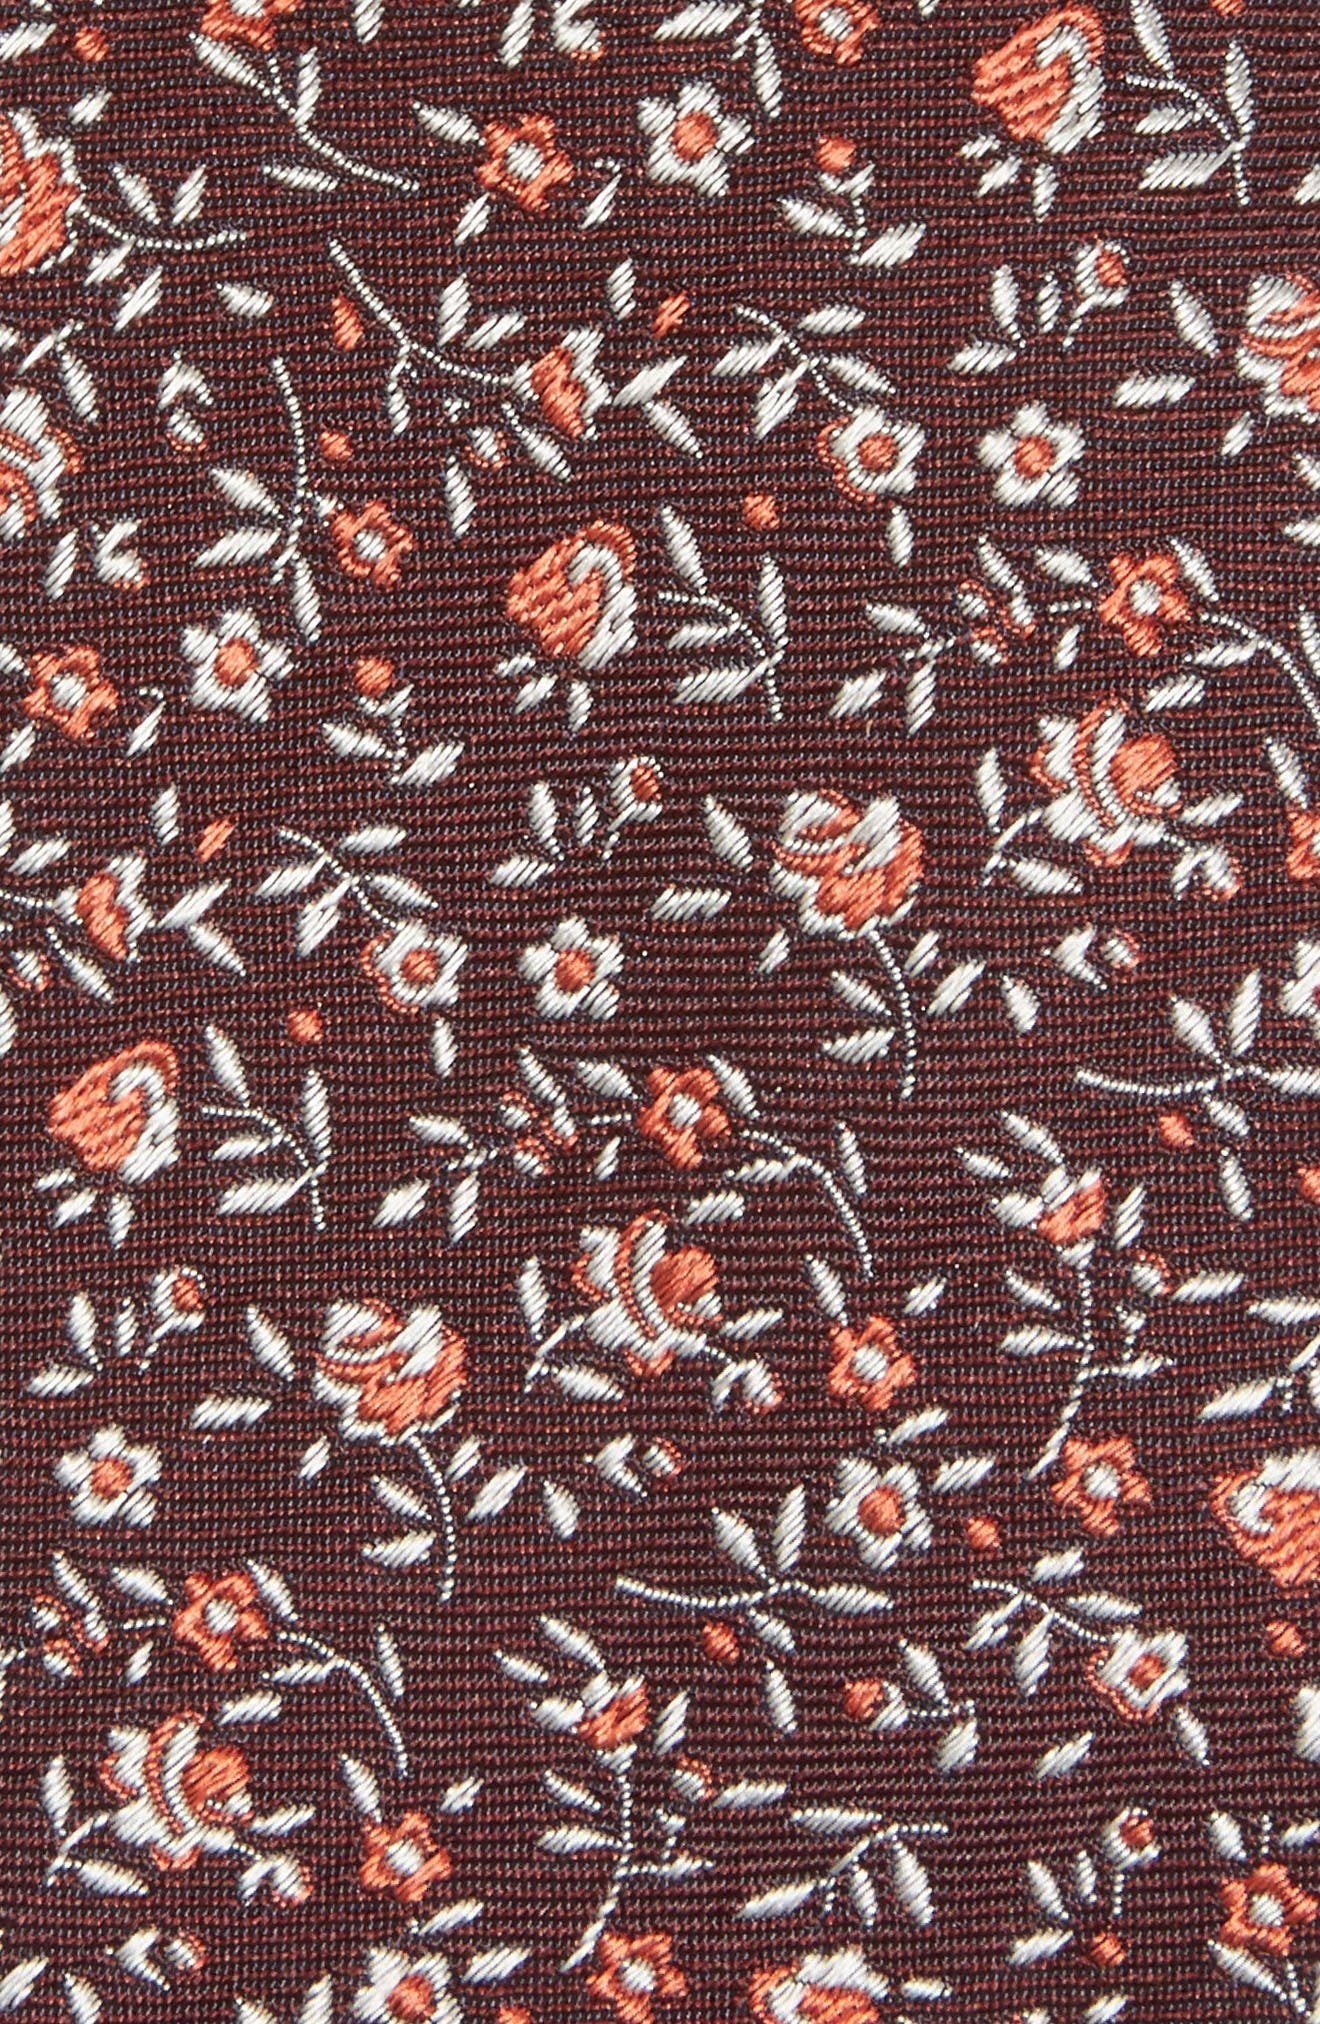 Floral Silk Skinny Tie,                             Alternate thumbnail 2, color,                             001